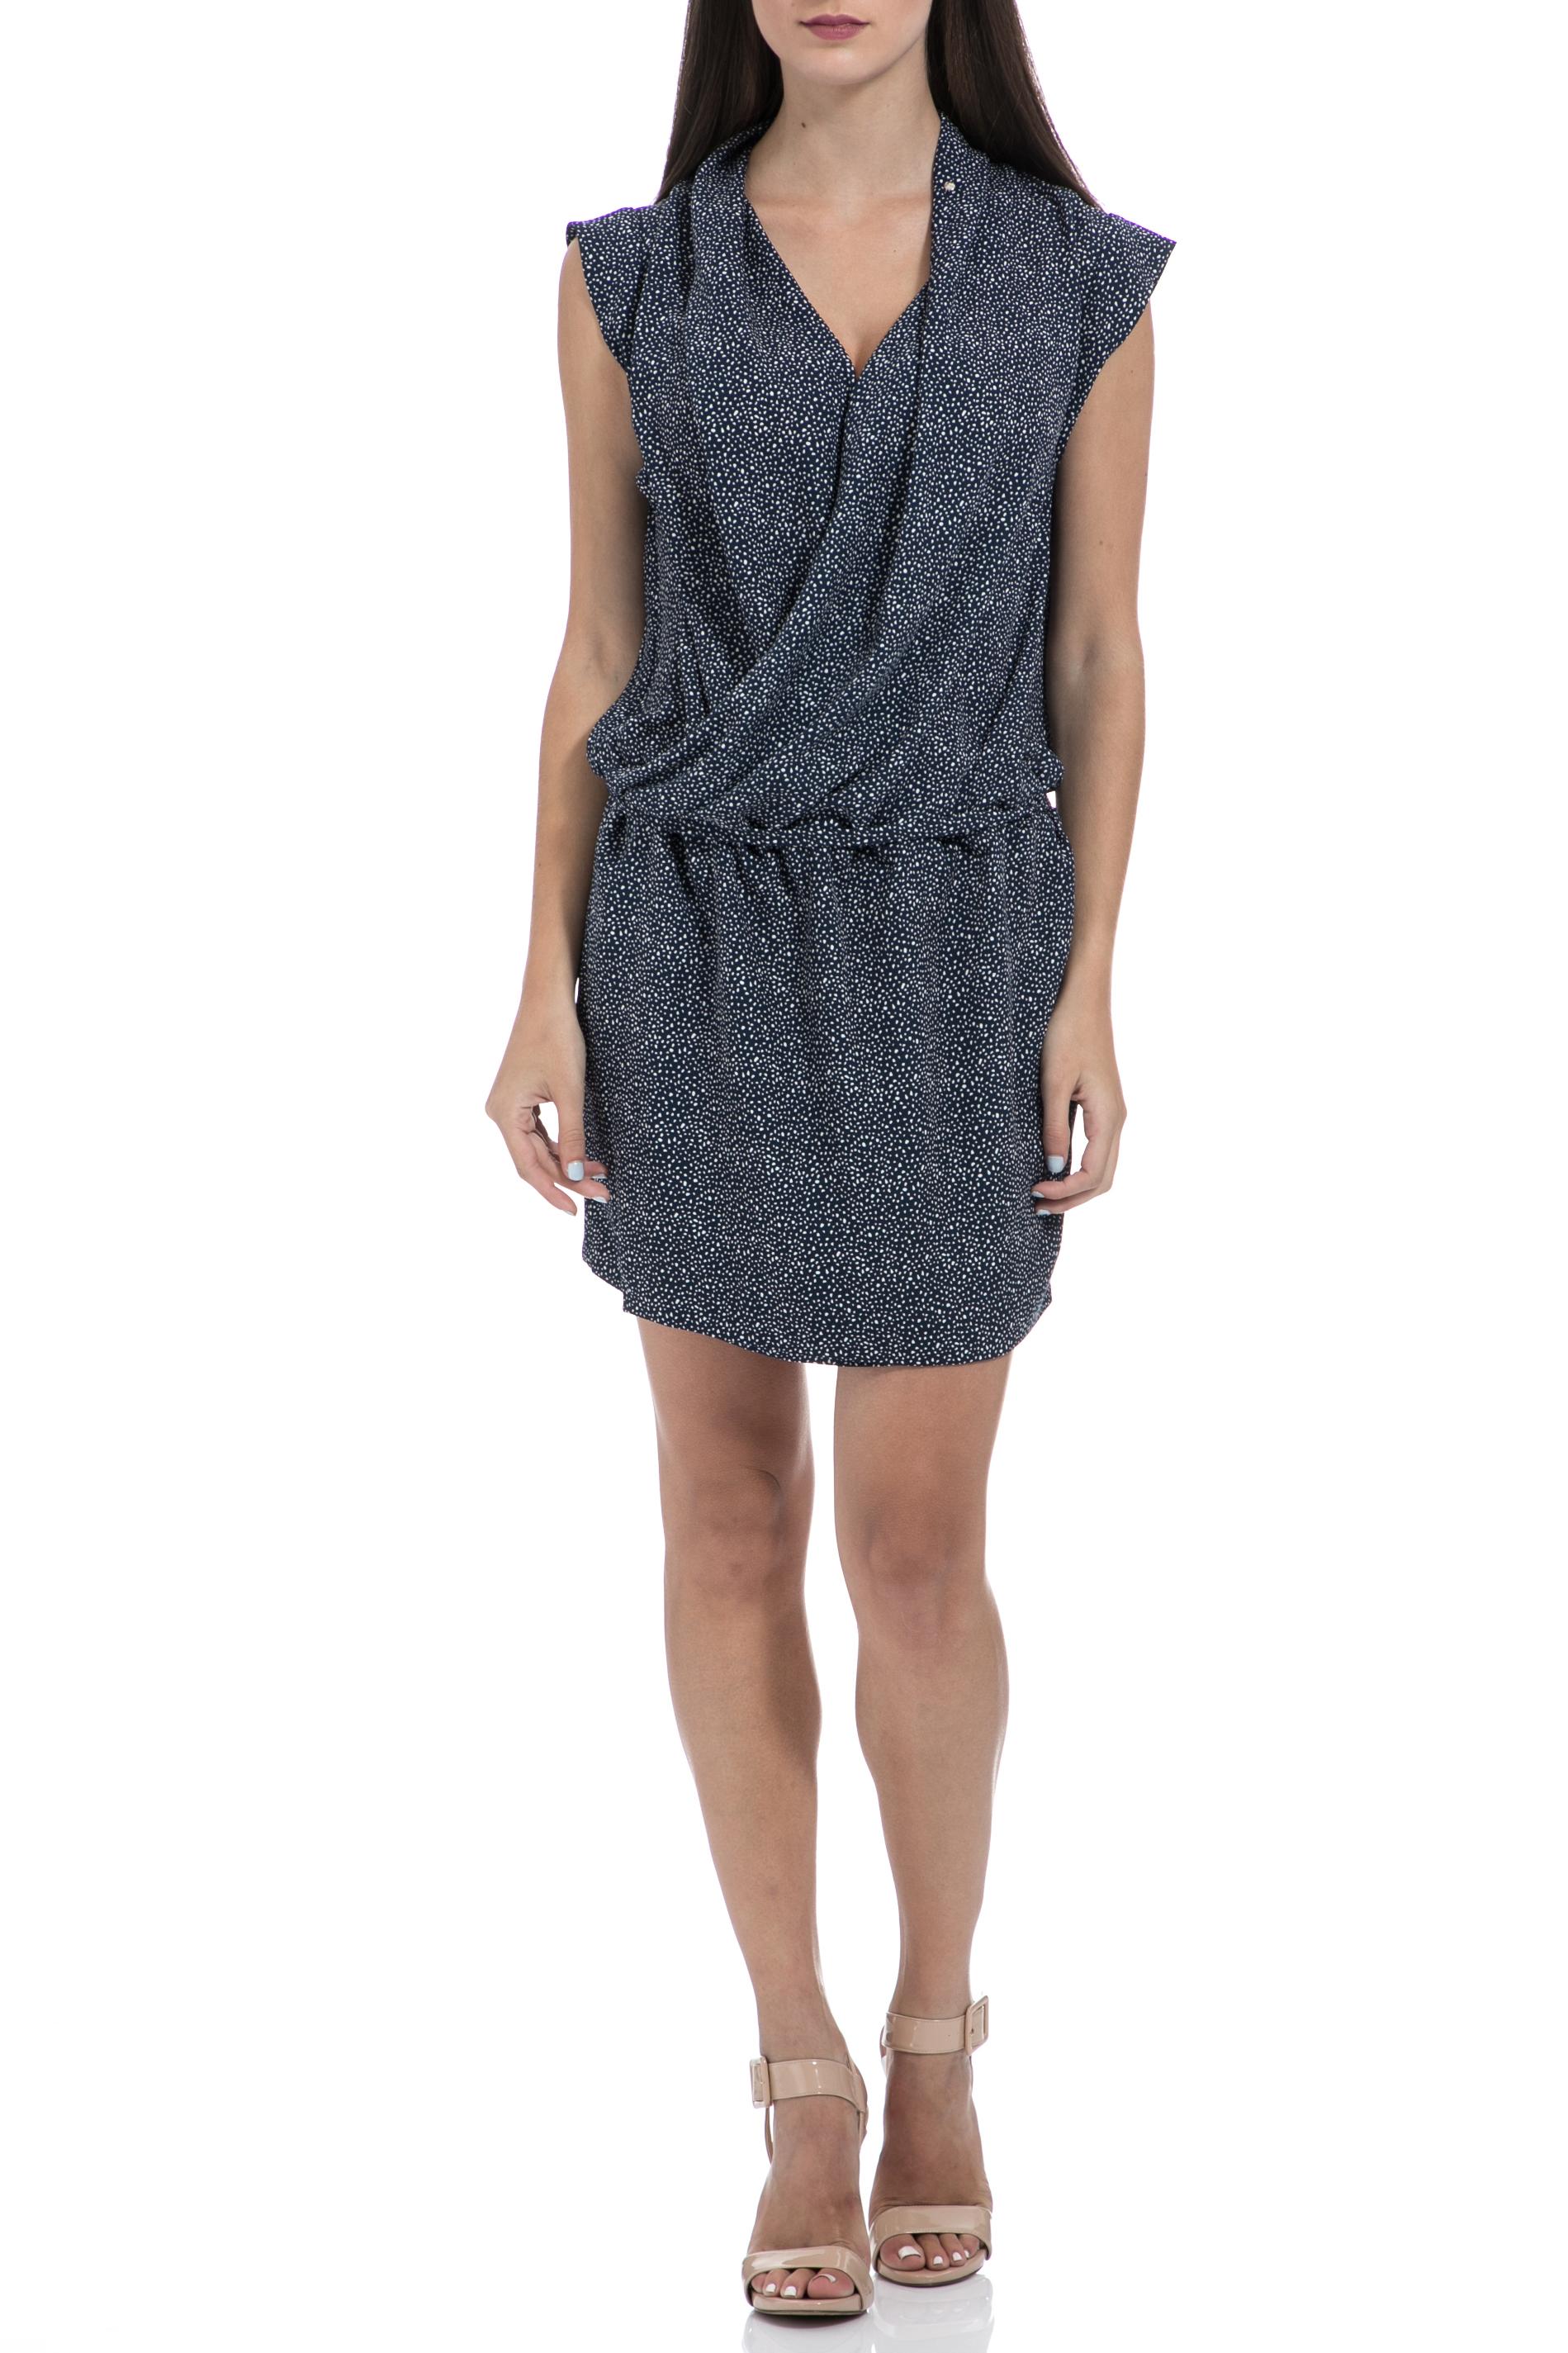 GAS - Γυναικείο φόρεμα GAS VESTITI VIKING DRESS CREPE PRI μπλε γυναικεία ρούχα φορέματα μίνι